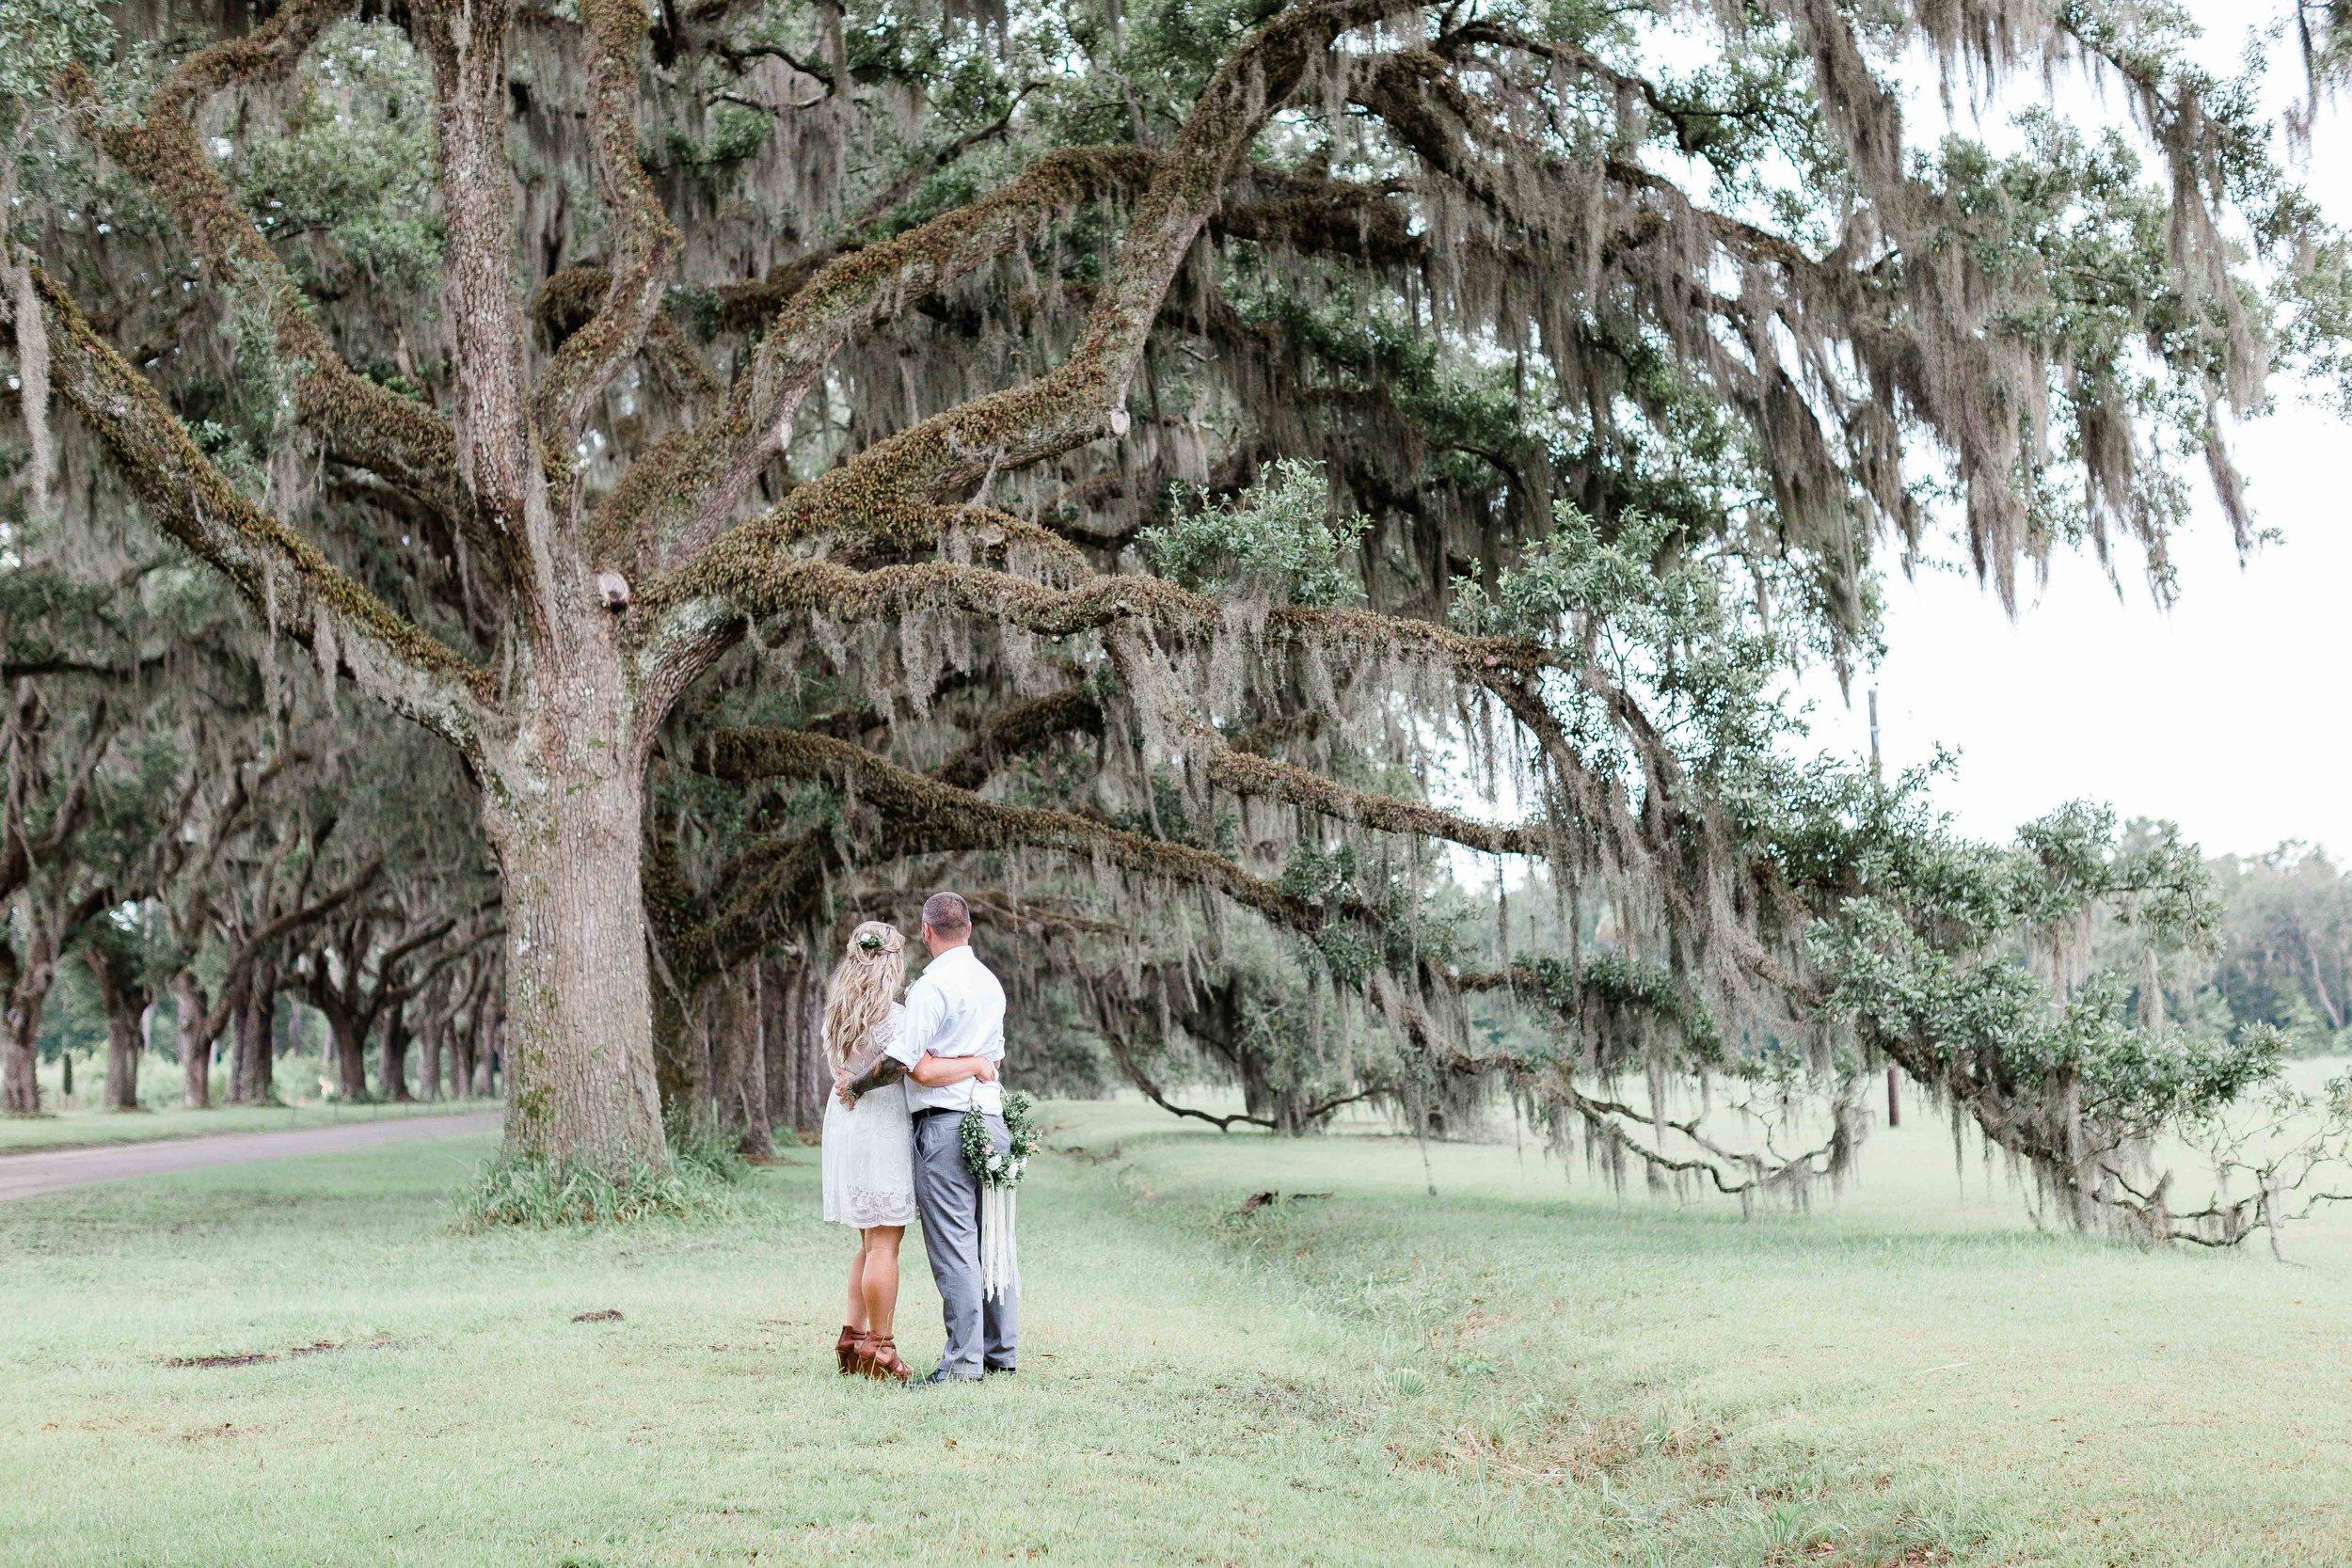 20190727Georgia-Wormlsoe Plantation-Simply Eloped-Savannah Wedding Photographer- Southern Lens Photography09.jpg